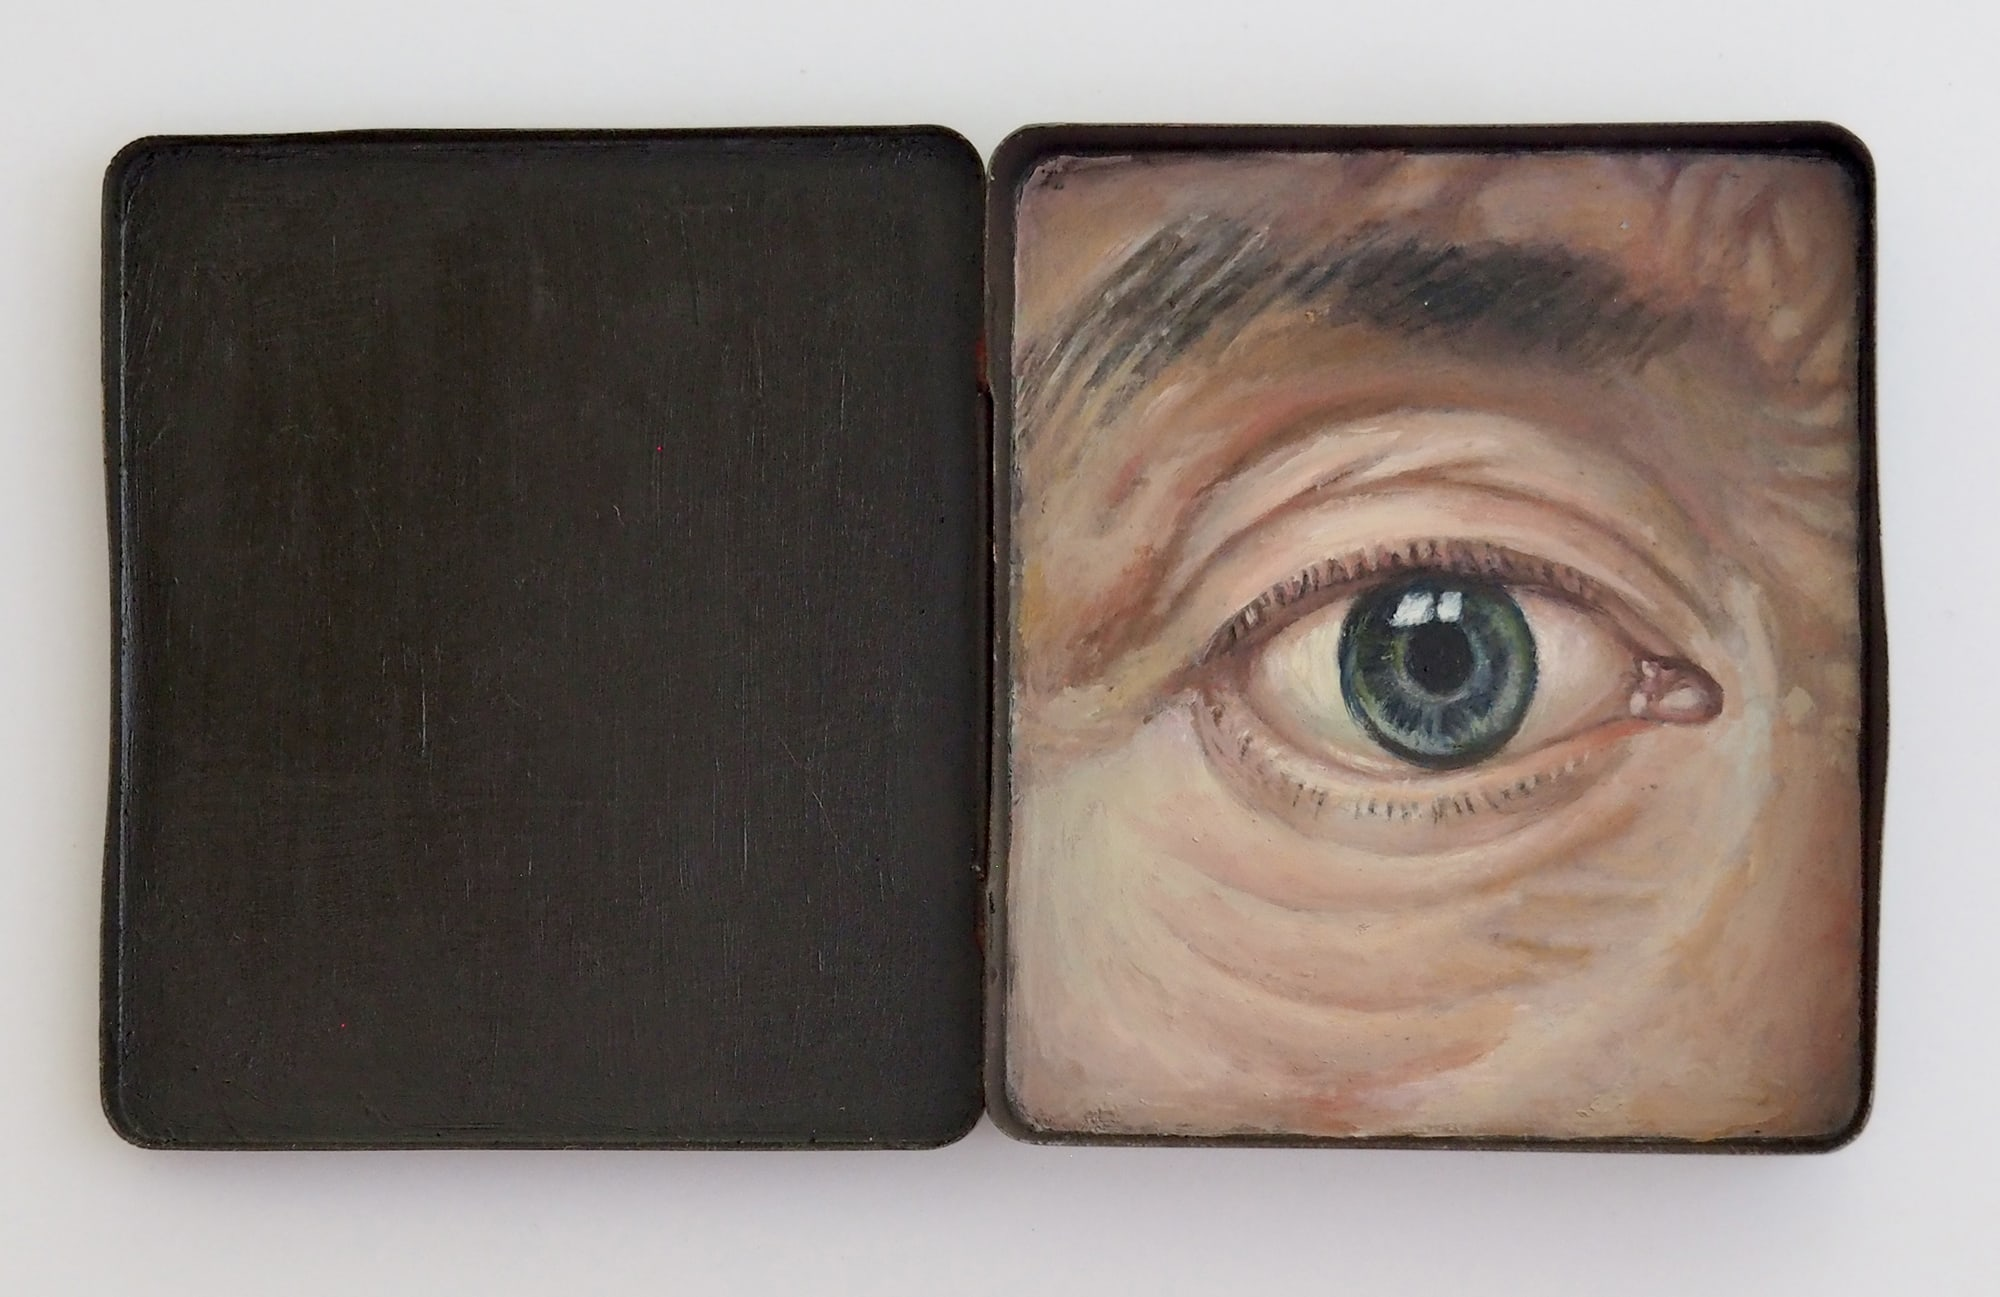 Robyn Rich. Christian. Inspired by a self portrait by Christian Seybold